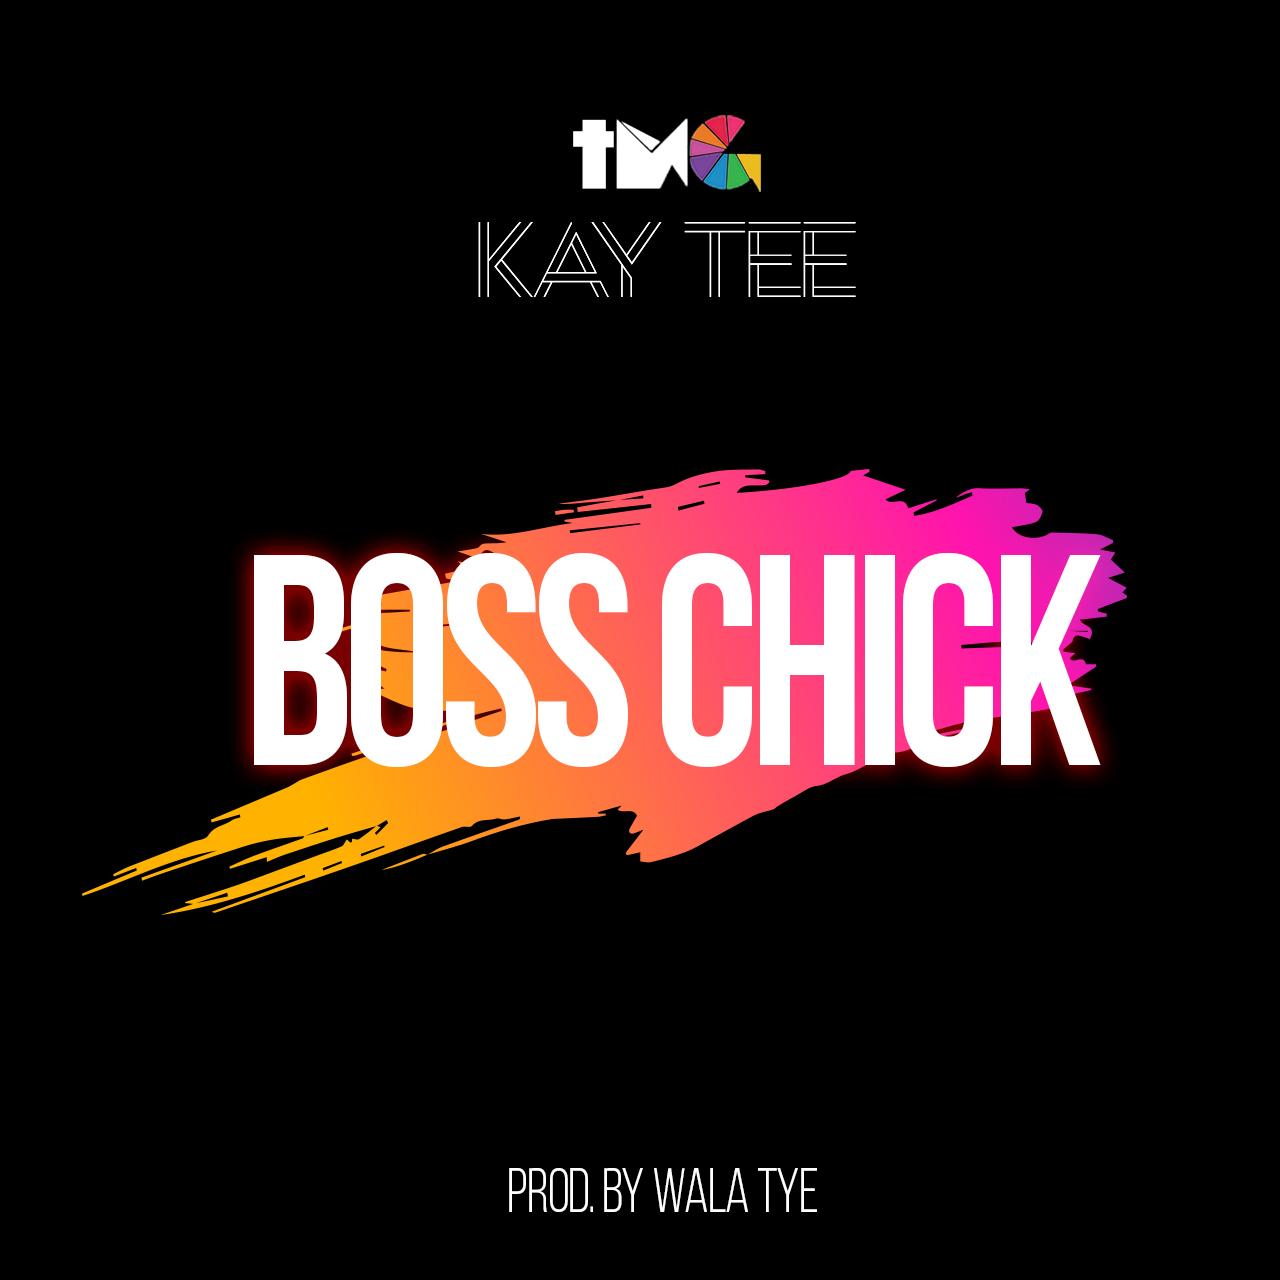 Kay Tee - BossChick (Prod by Wala Tyre)